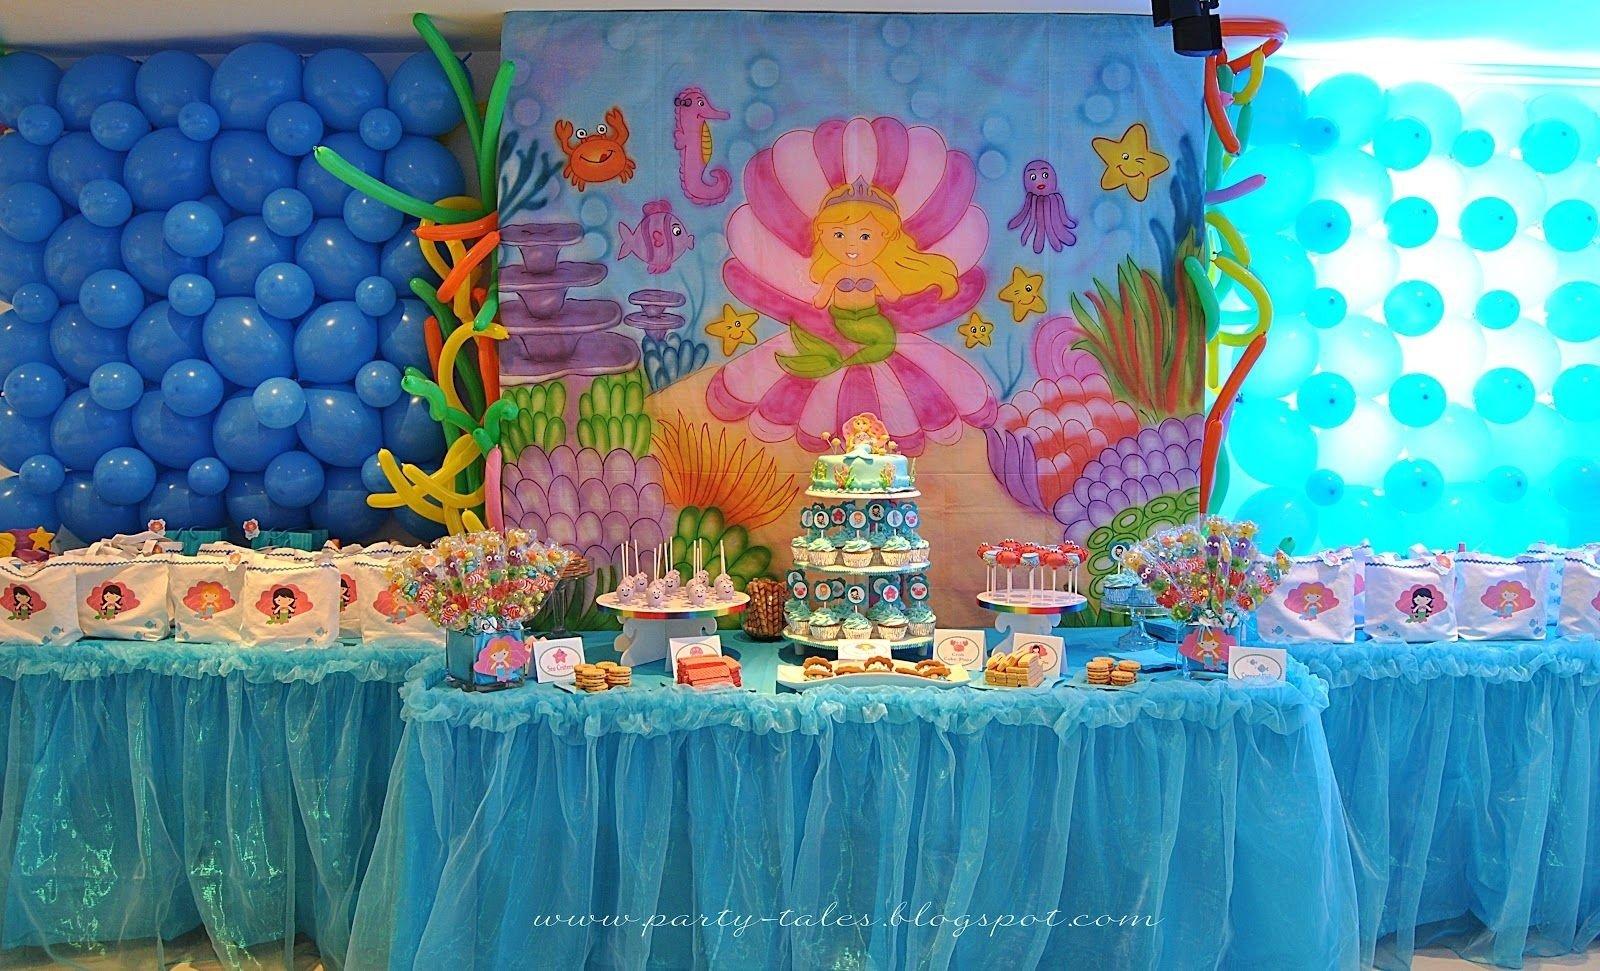 10 Fabulous Under The Sea Party Decoration Ideas under the sea decorations party tales birthday party under 1 2021